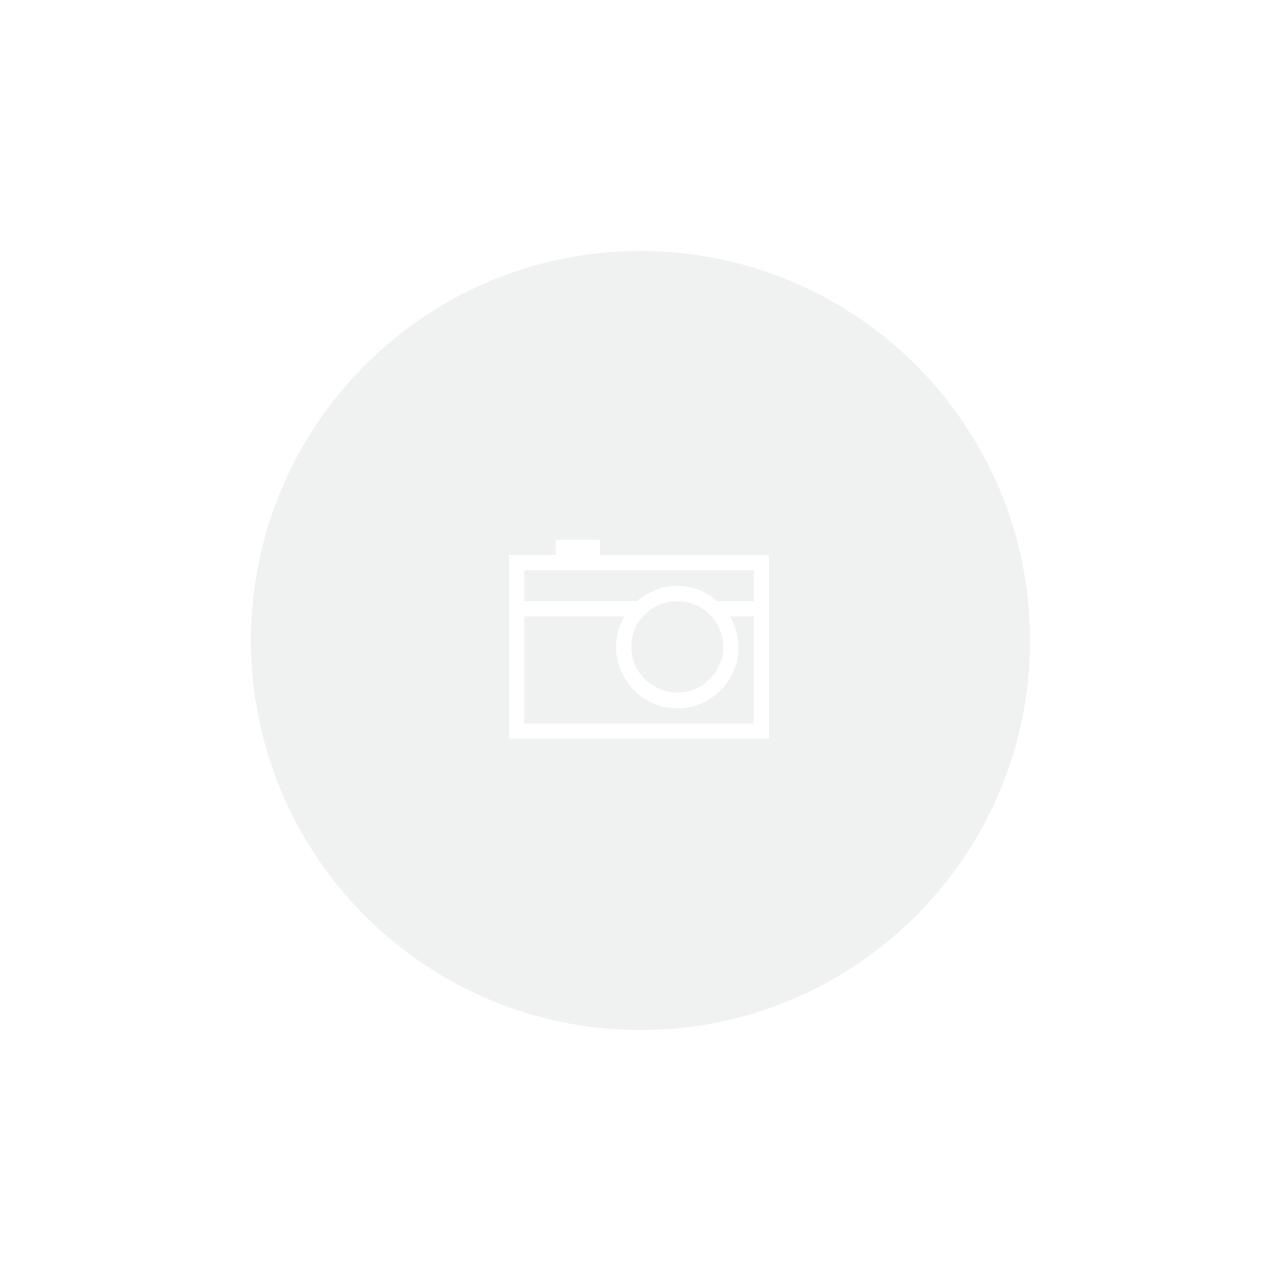 Placa de Vídeo Gigabyte Geforce RTX 2080 Gaming OC 8GB GV-N2080GAMING OC-8GC GDDR6